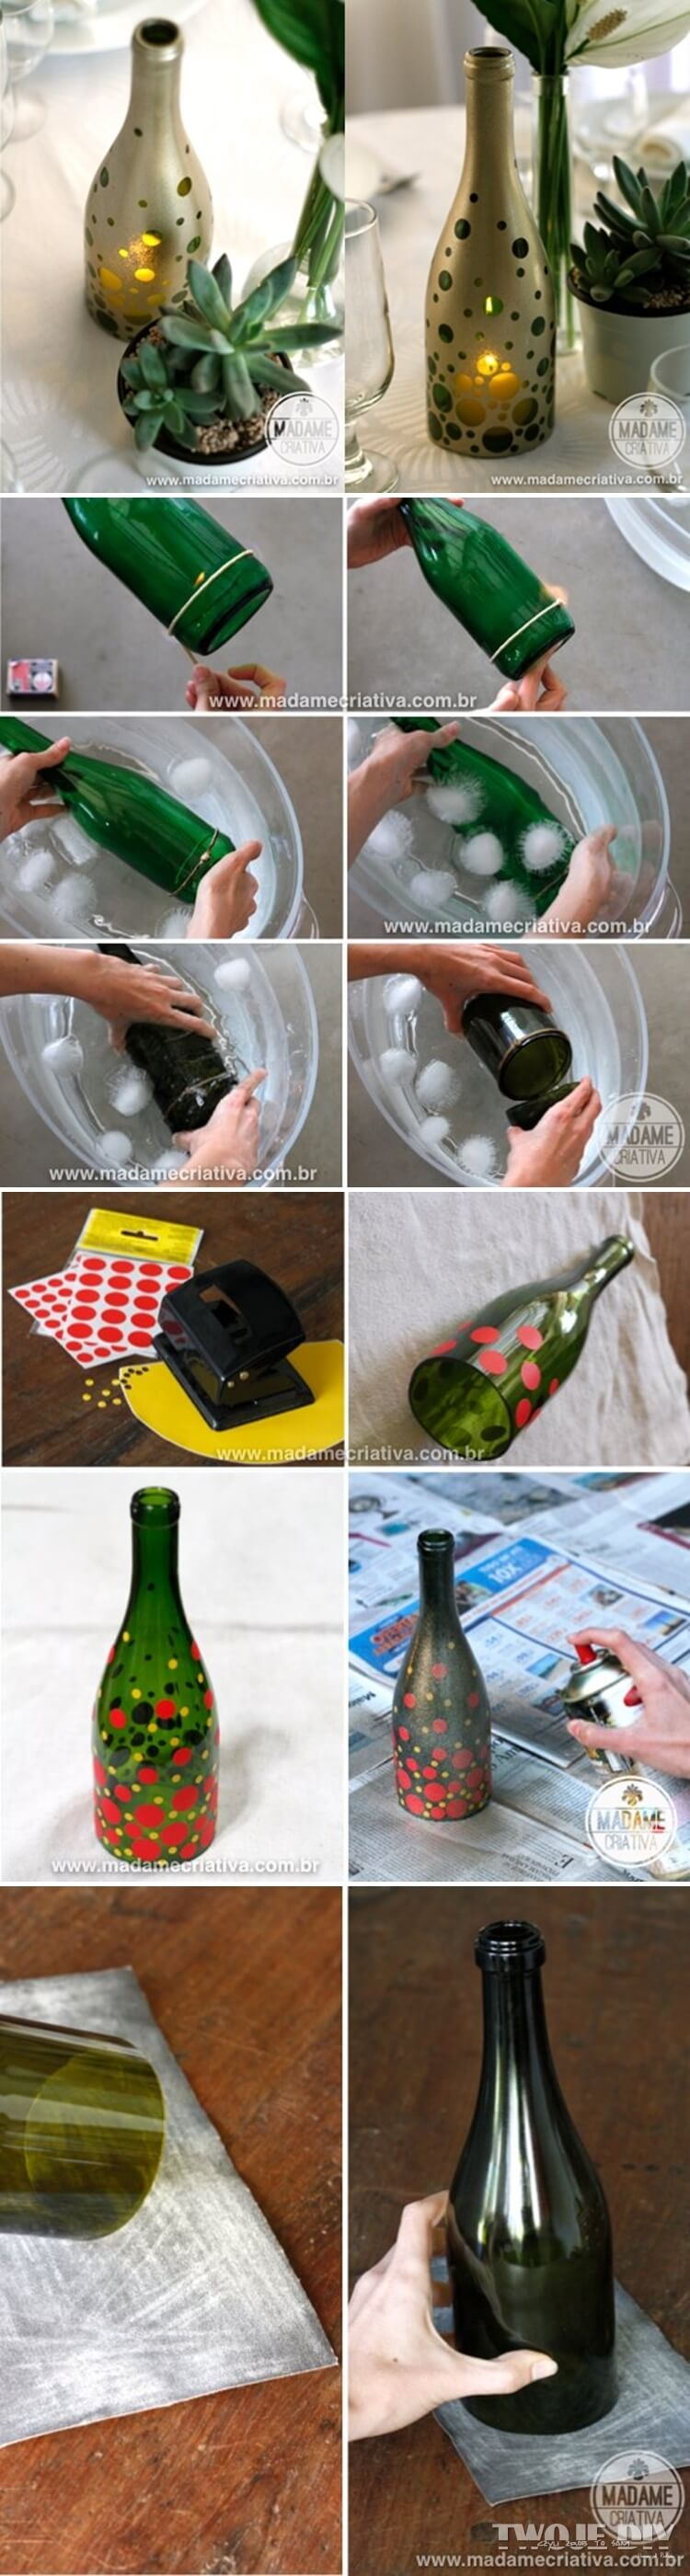 manualidades para reciclar botellas de vino 11